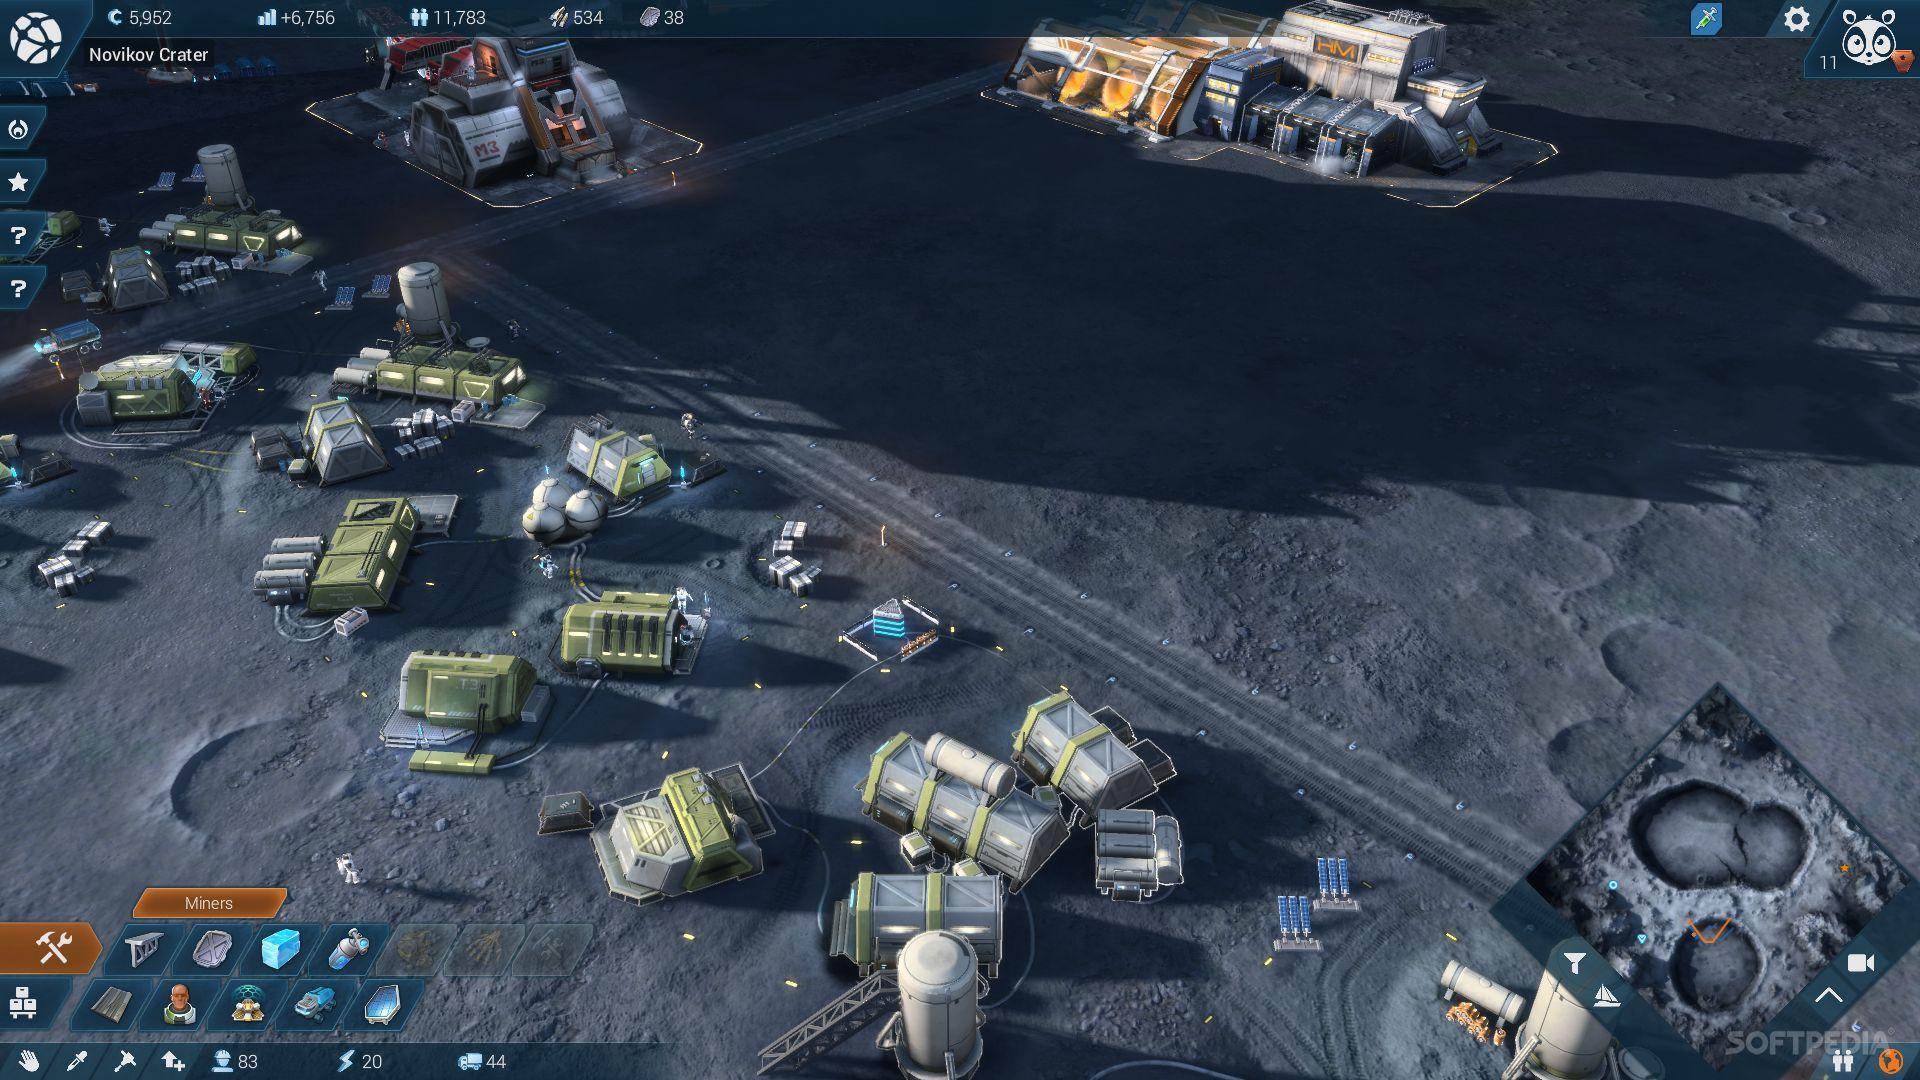 Colony Building Exploration Games